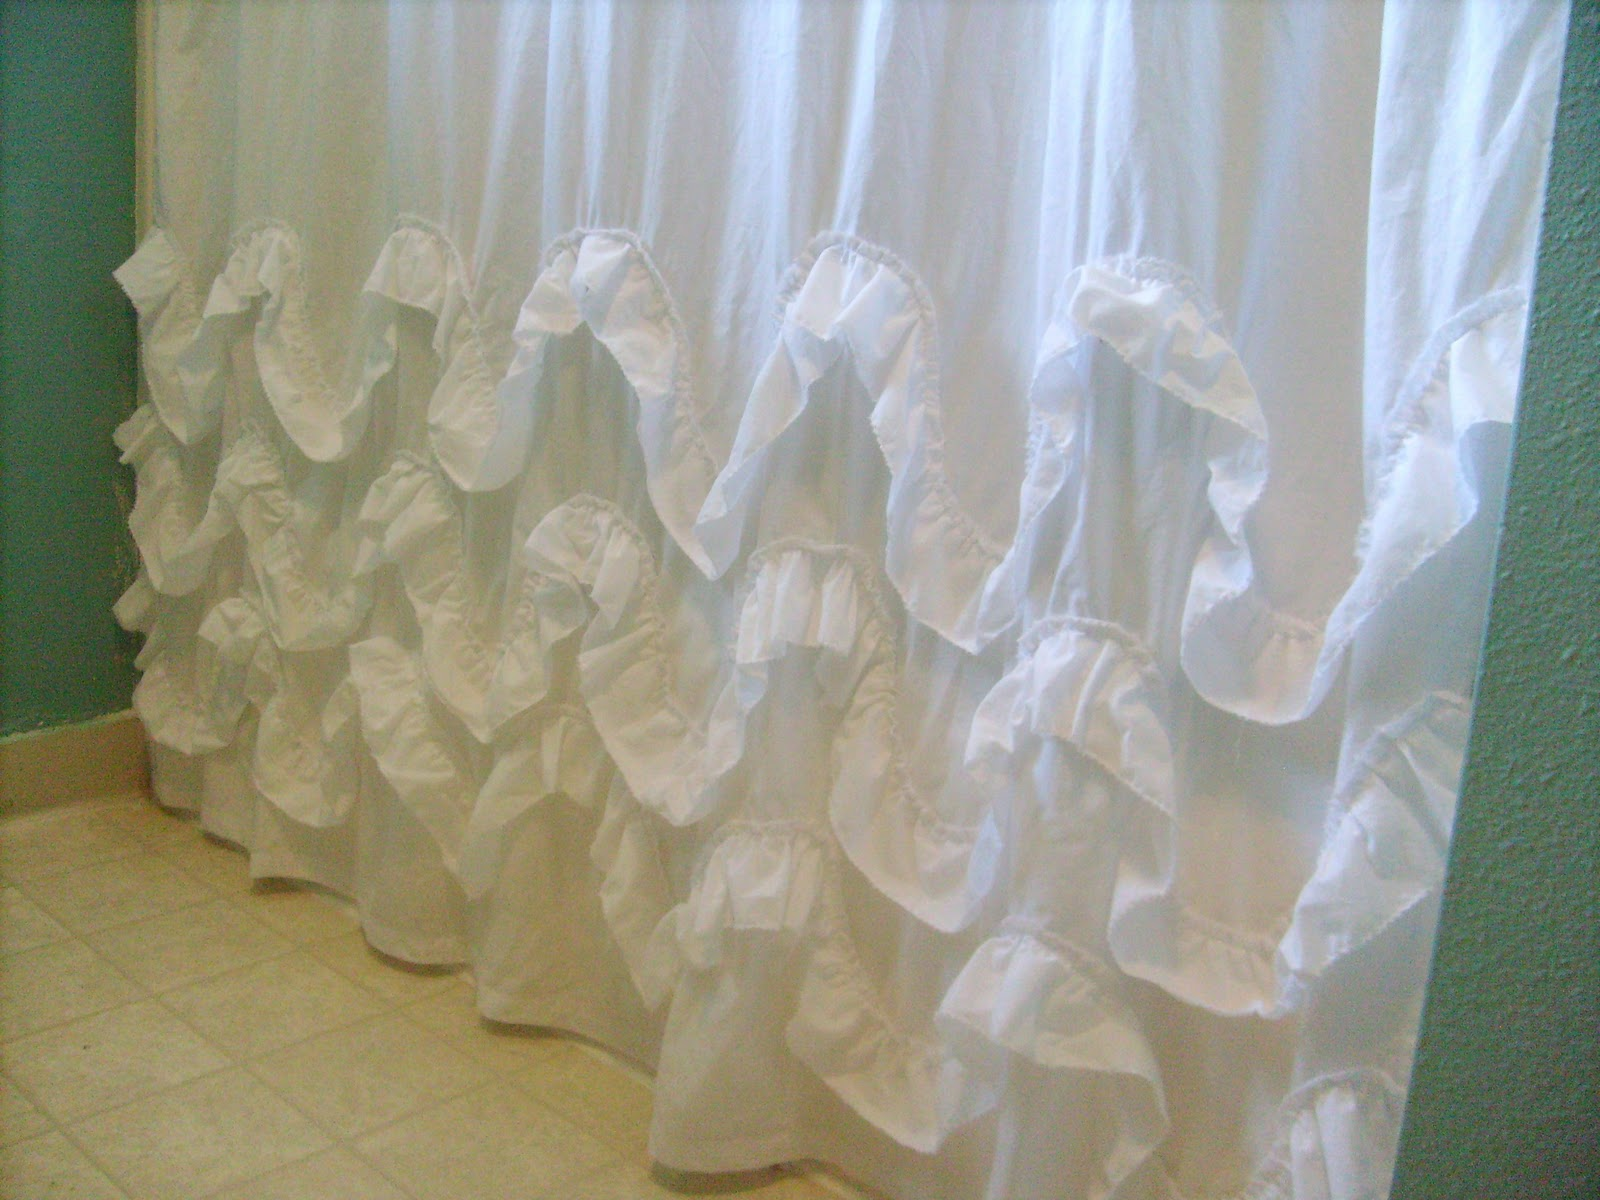 Diy ruffled shower curtain - Diy Ruffled Shower Curtain 10